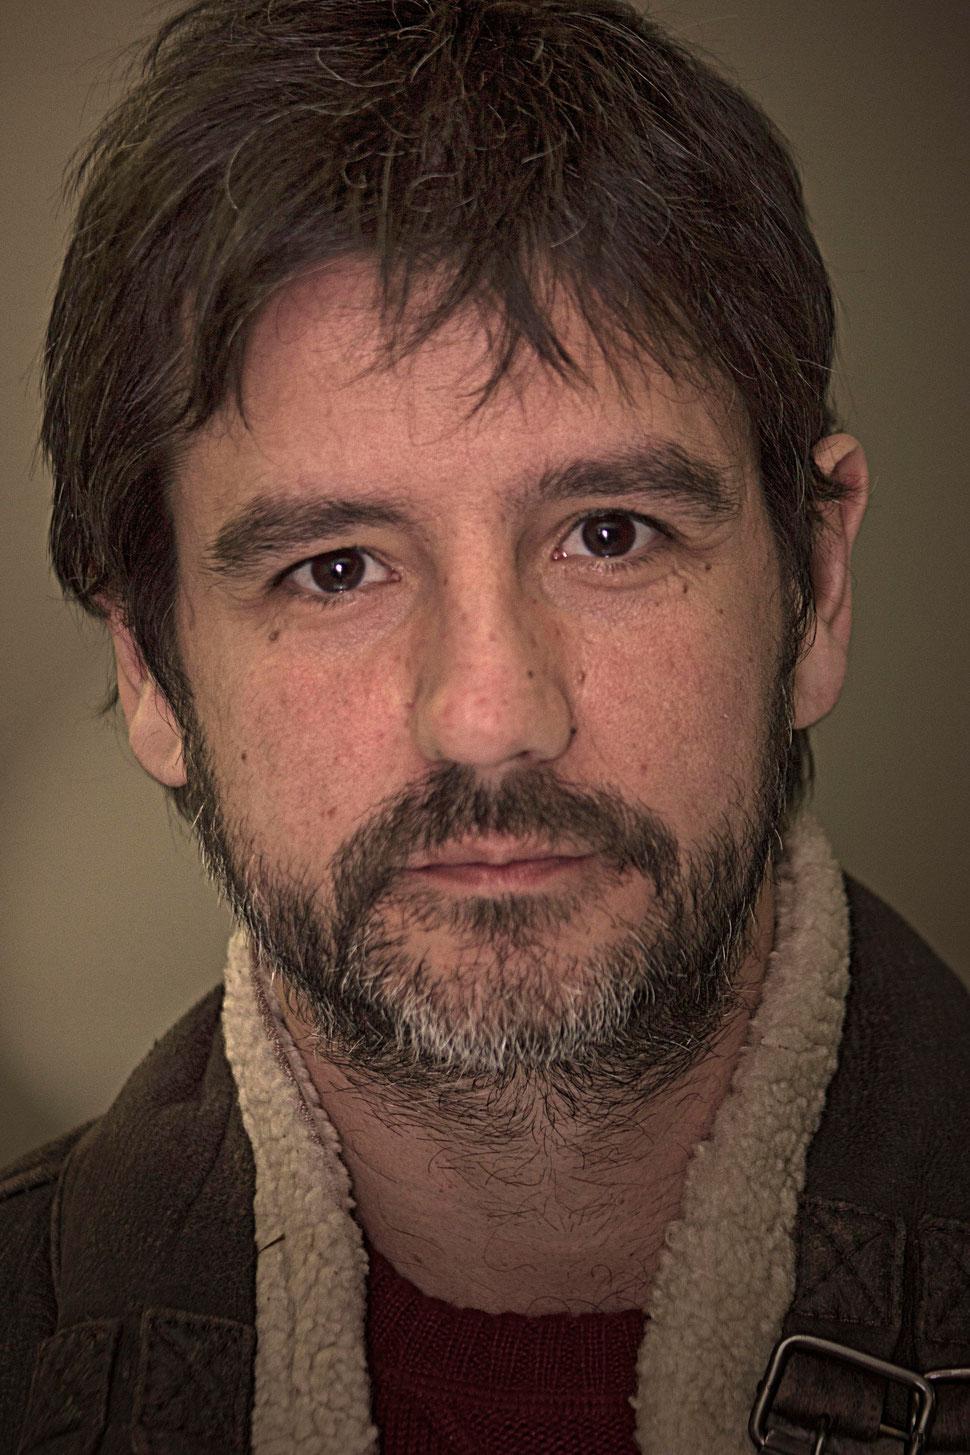 Antonio Hortelano